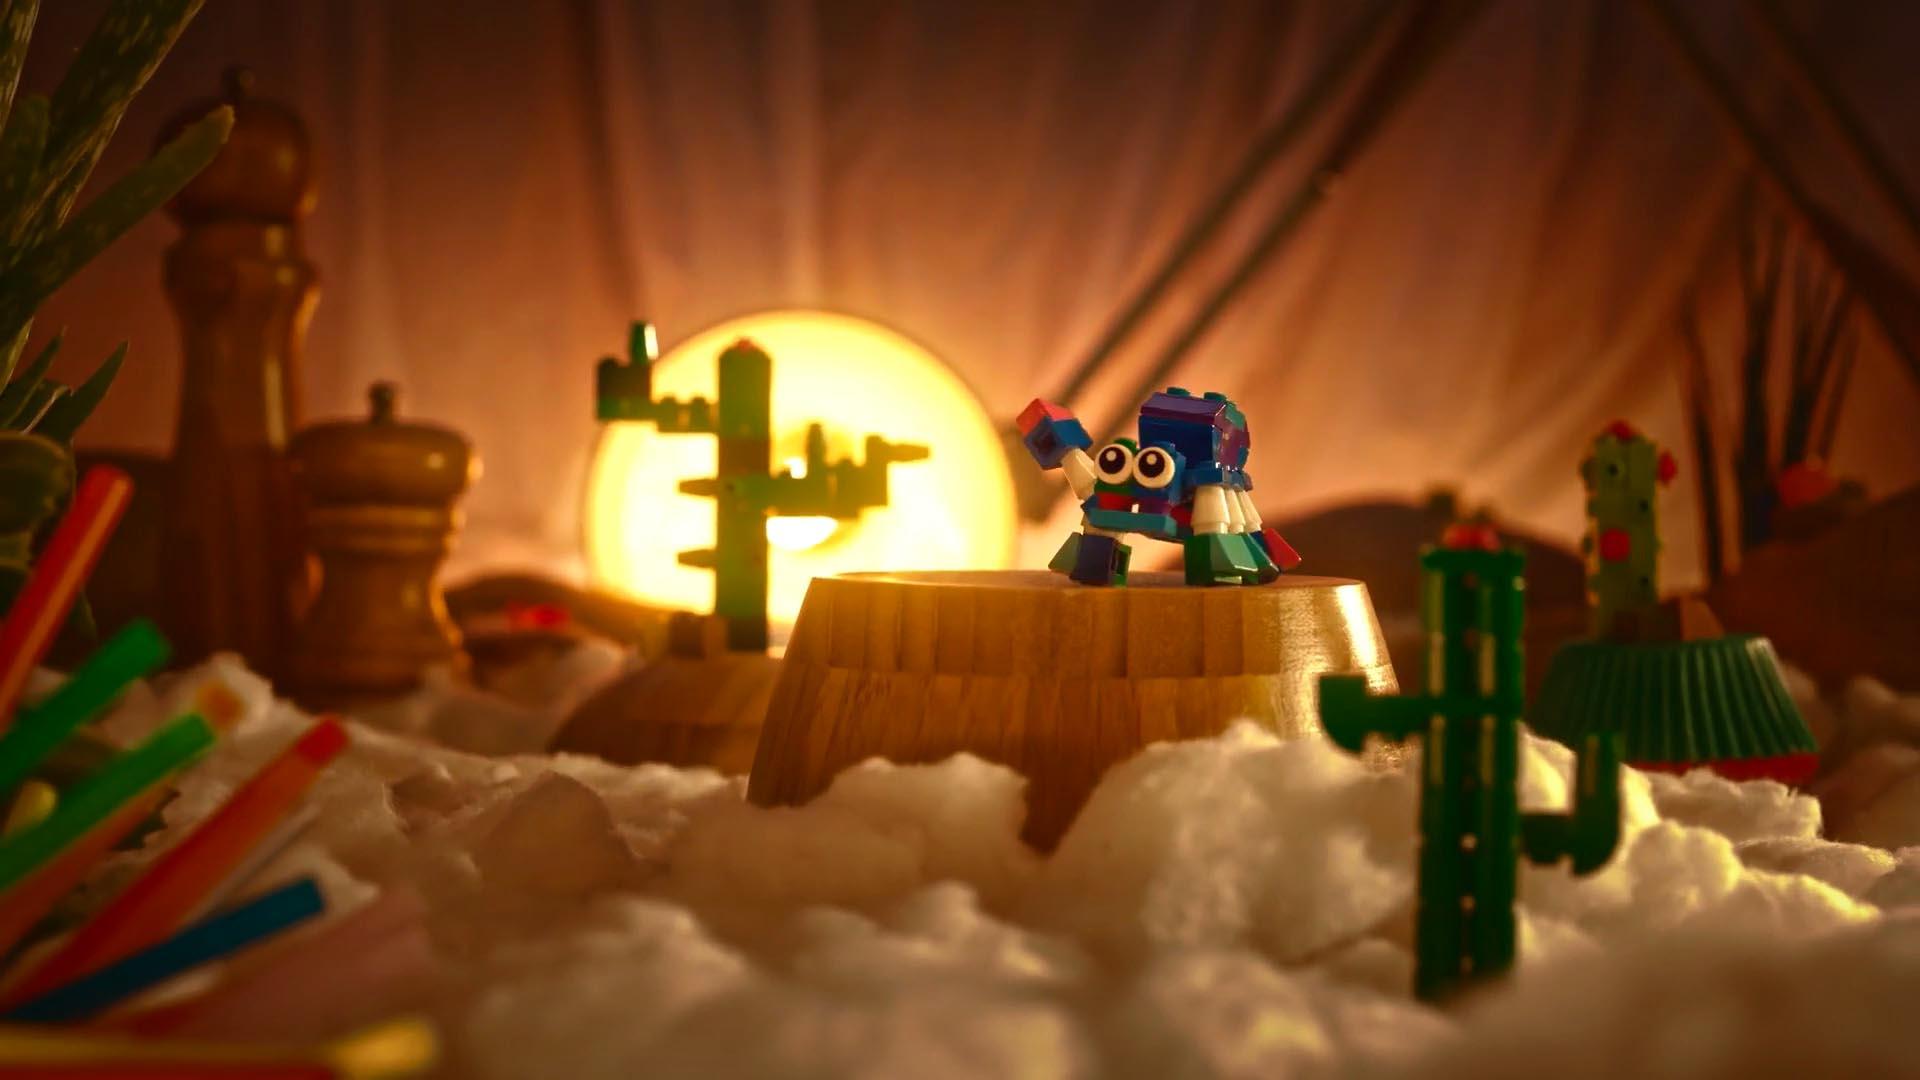 BA_Web_LegoCSSC_PR_02